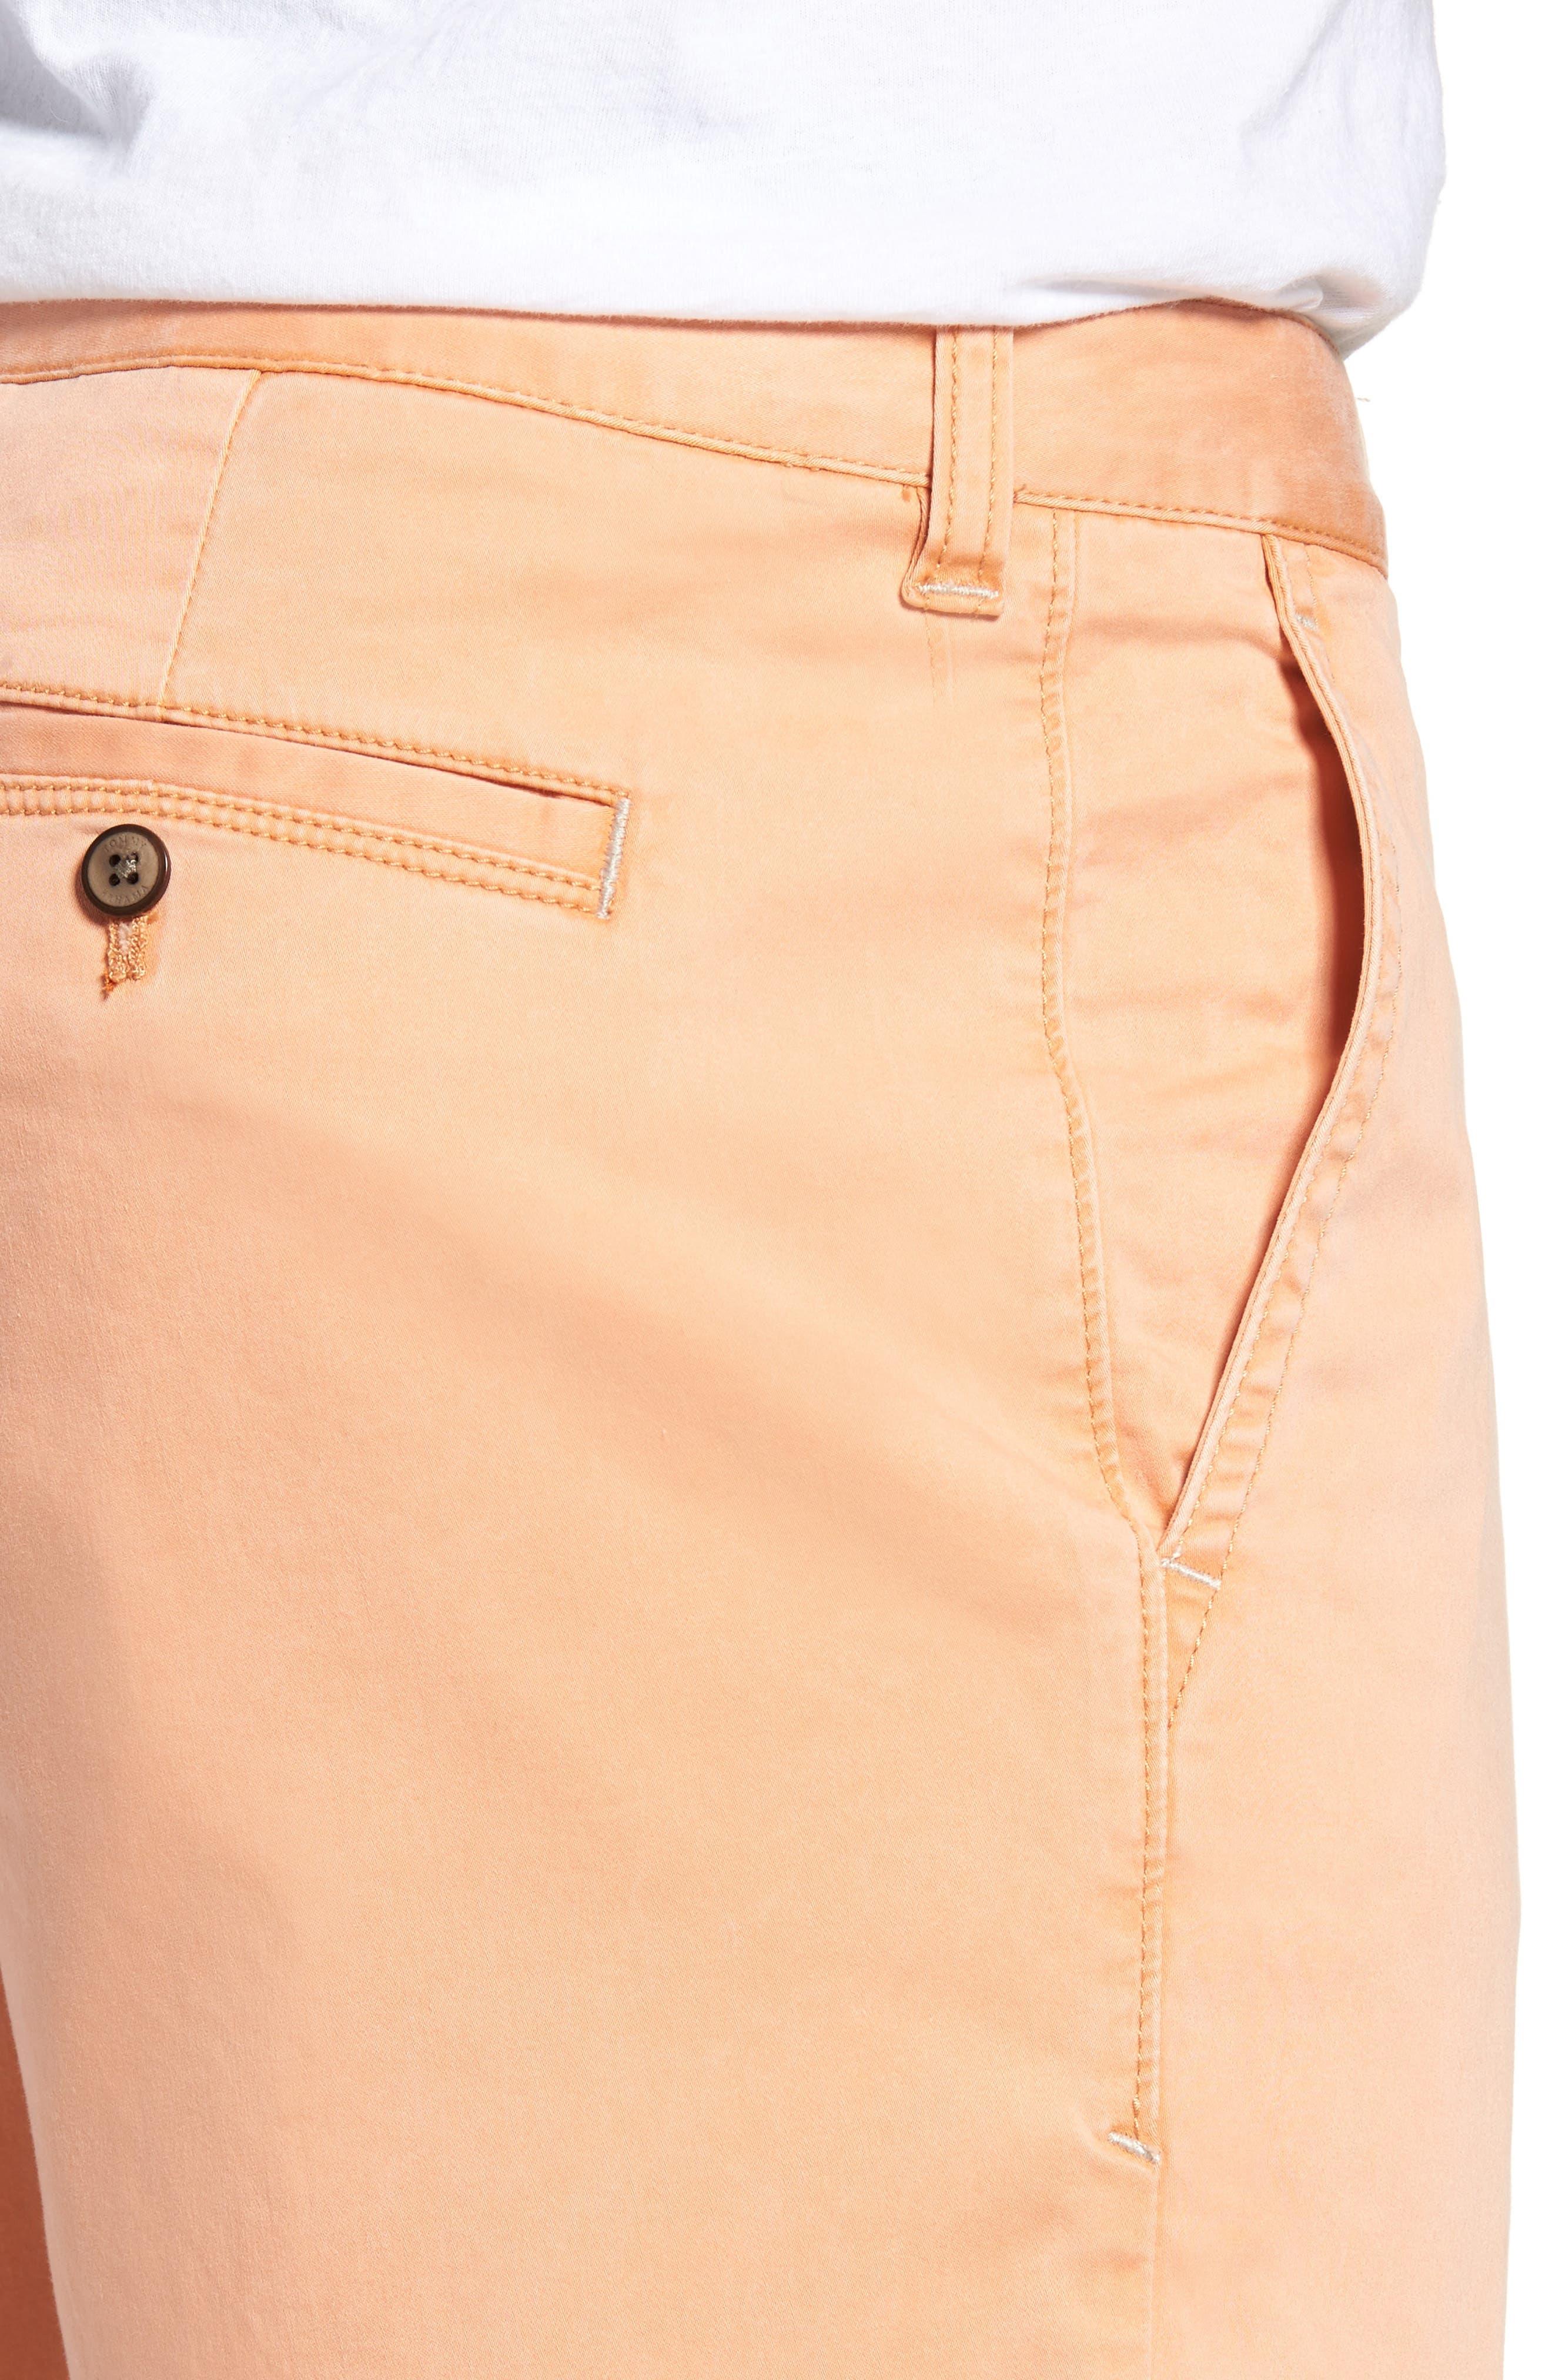 Boracay Chino Shorts,                             Alternate thumbnail 34, color,